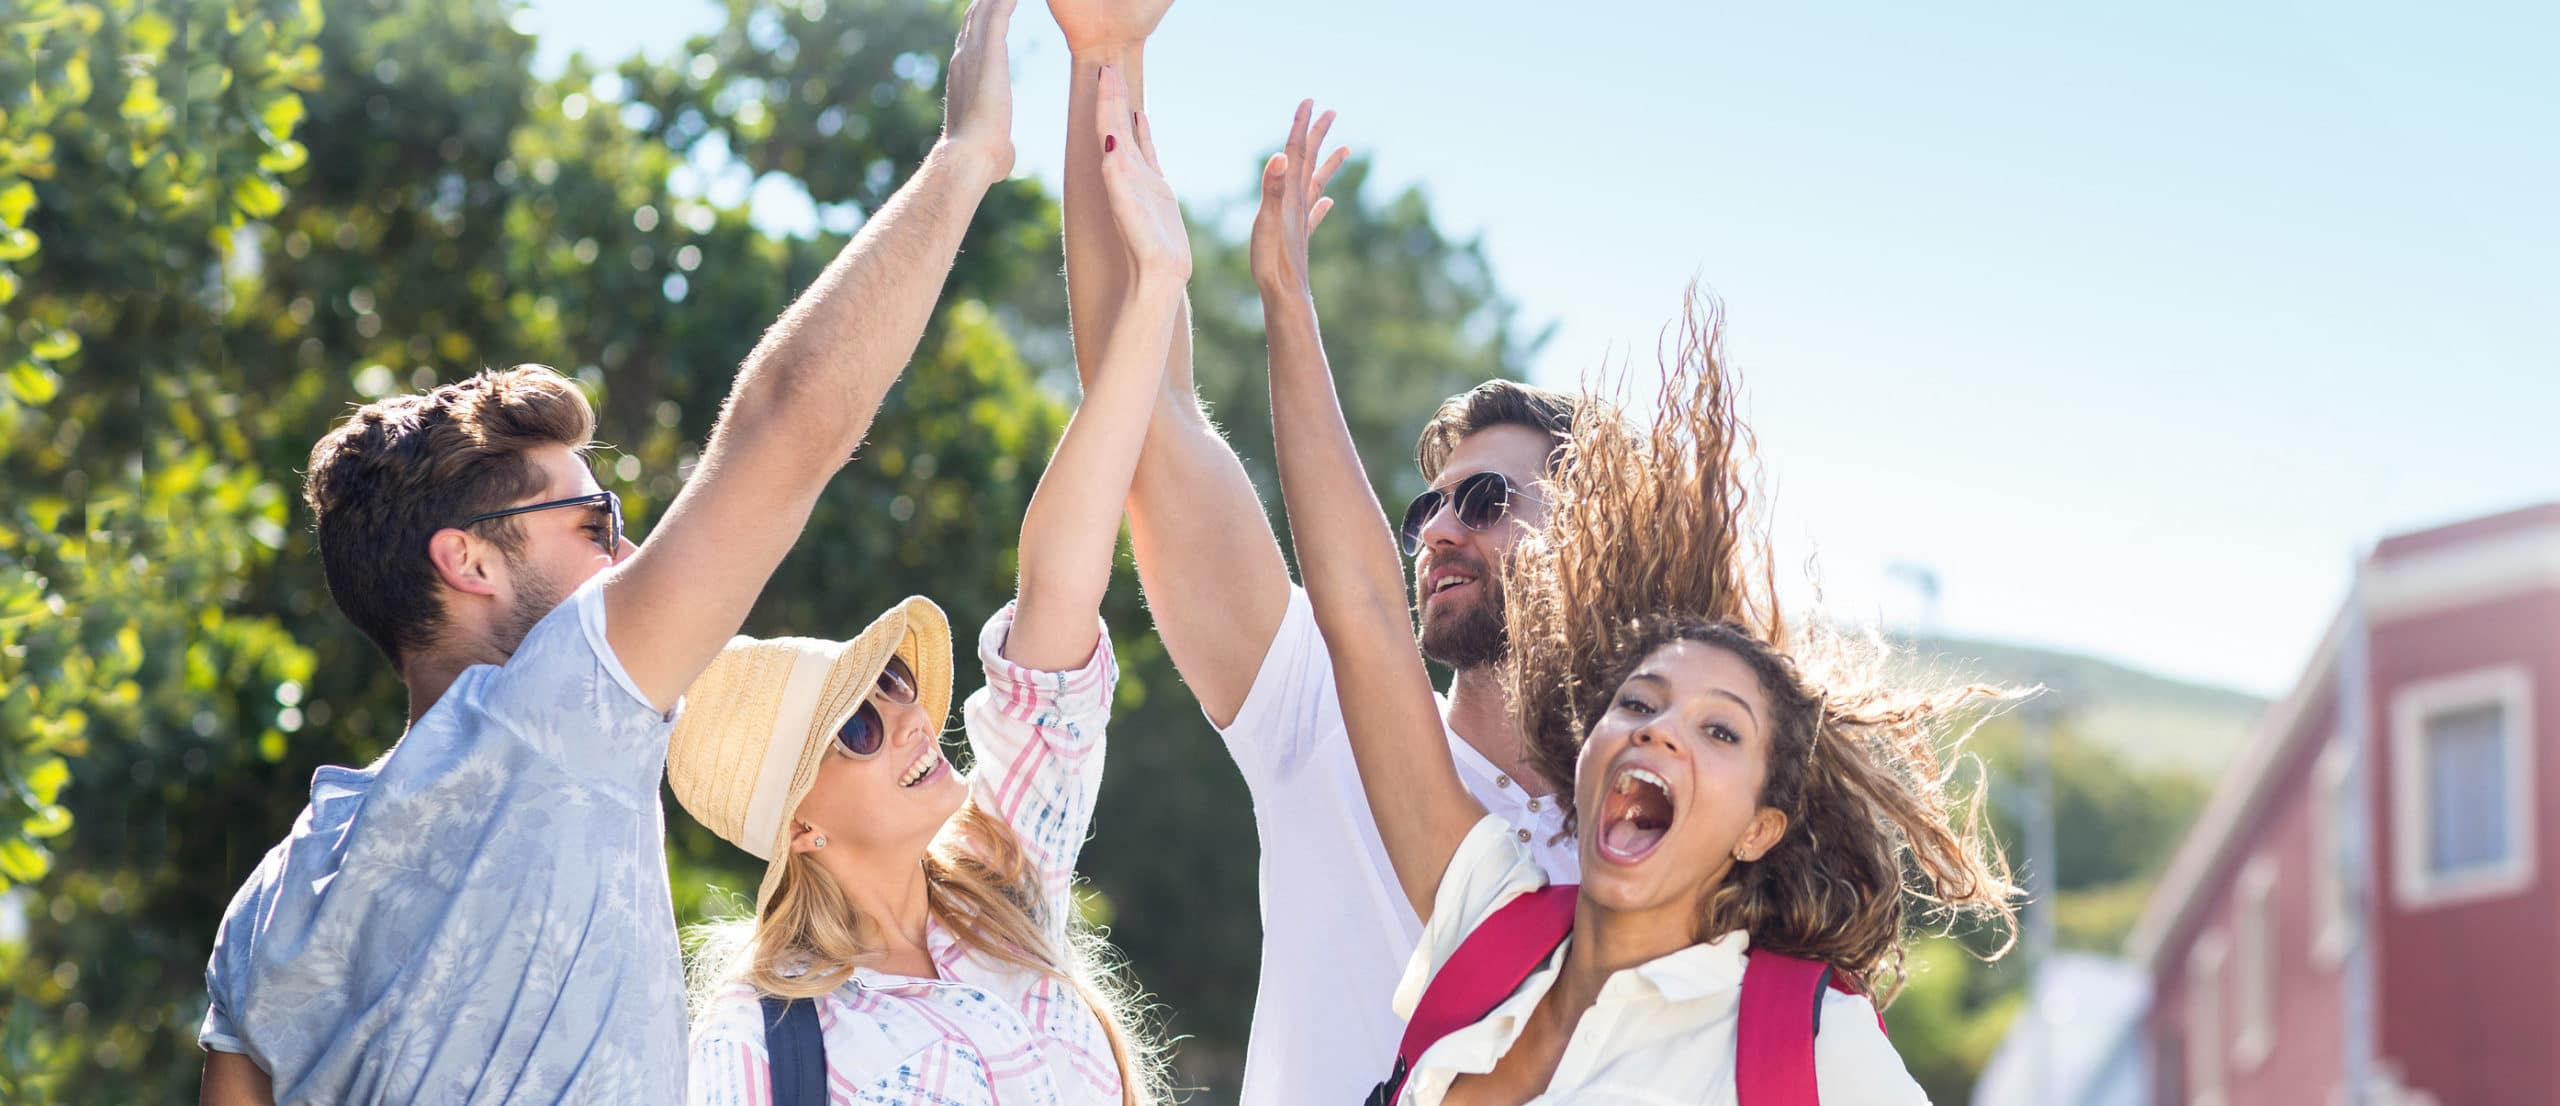 Four friends high-five outdoors